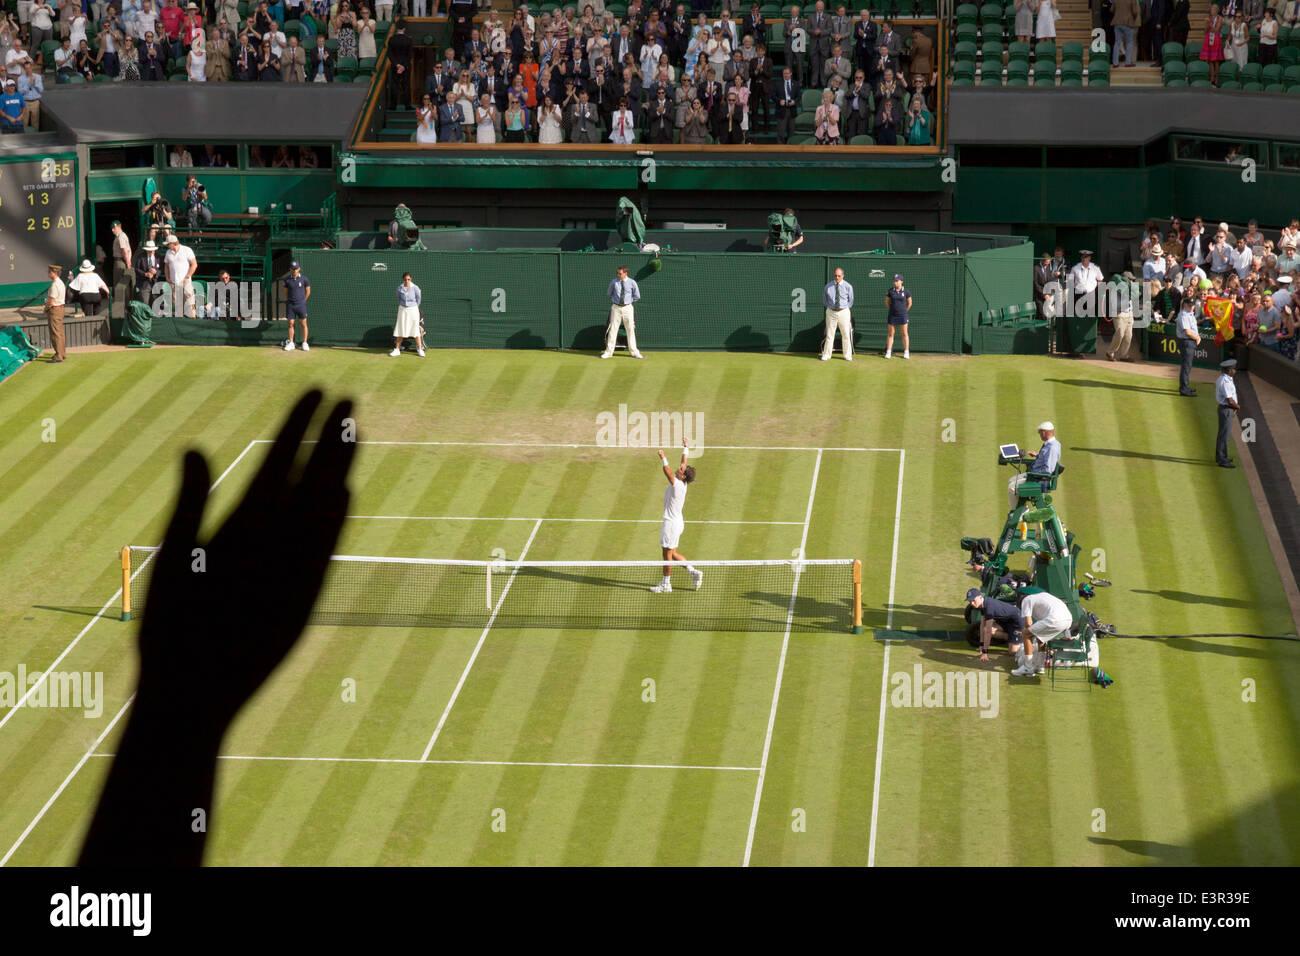 Rafael Nadal ganó su primera ronda mens escoge el fósforo en el Campeonato de Wimbledon, en el centro de la Cancha, Wimbledon, Londres, Gran Bretaña. Foto de stock